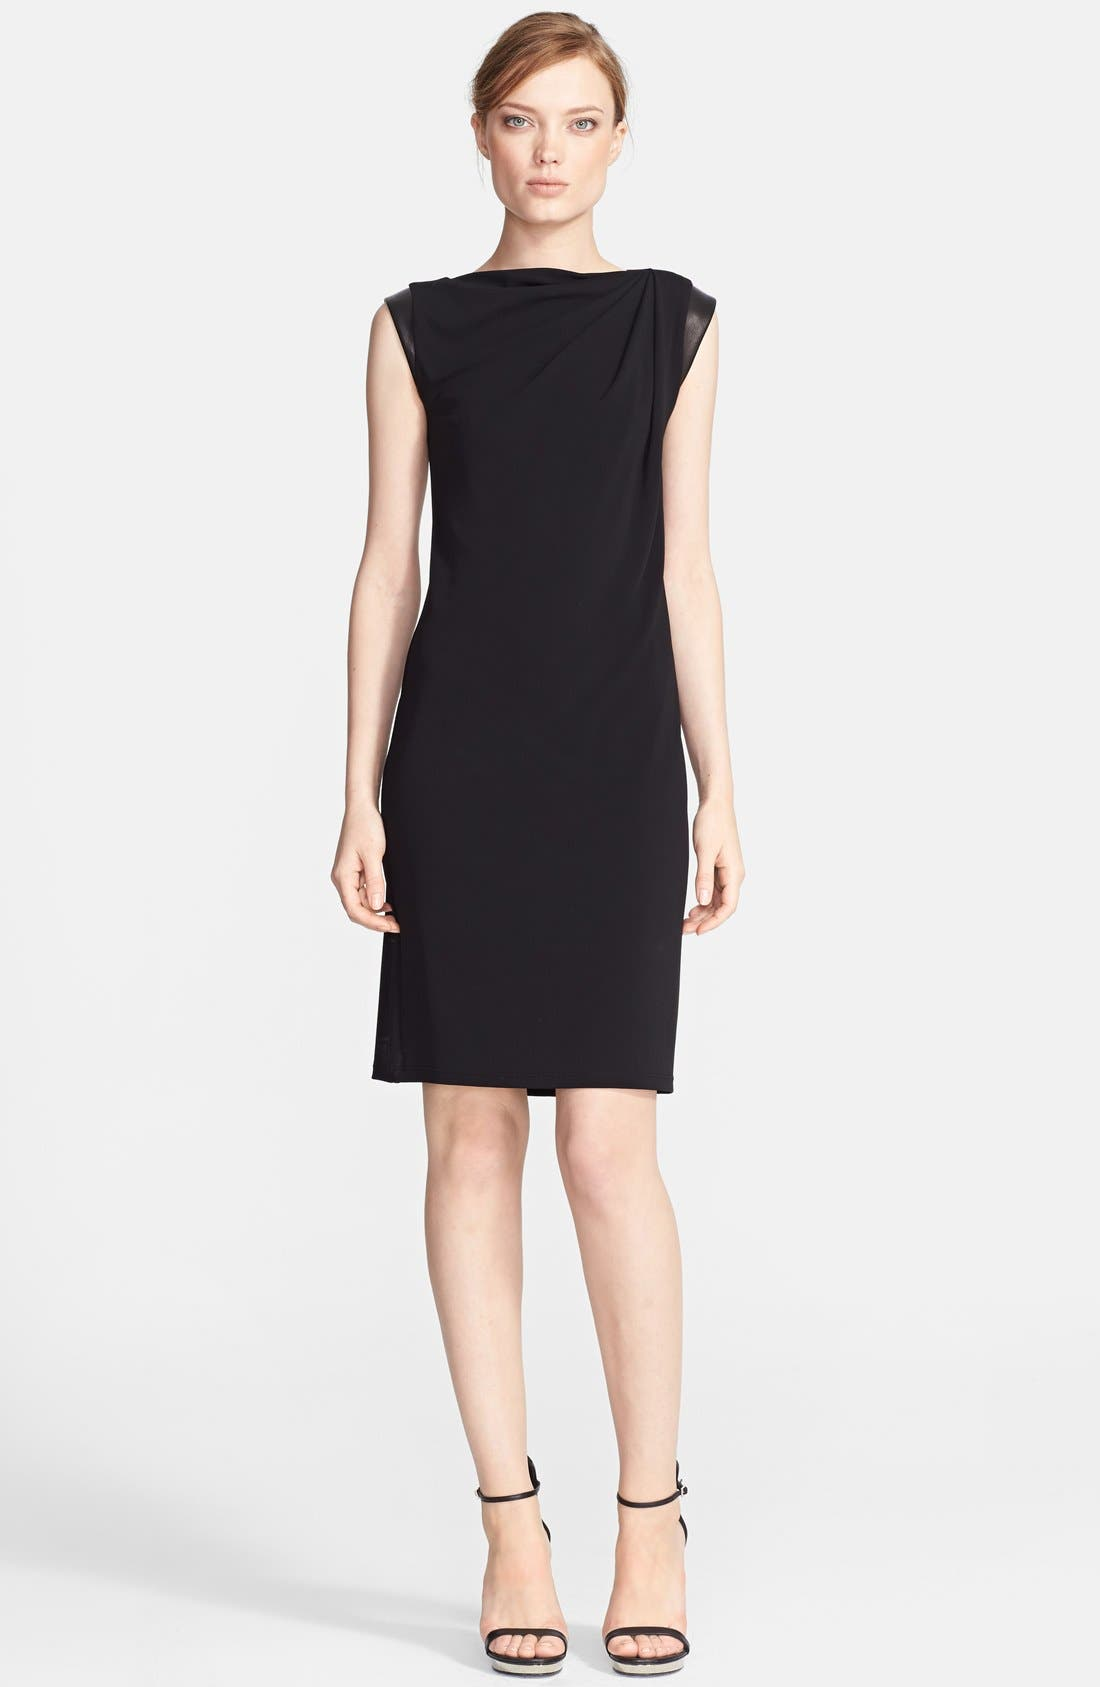 Alternate Image 1 Selected - Michael Kors Cap Sleeve Jersey Dress